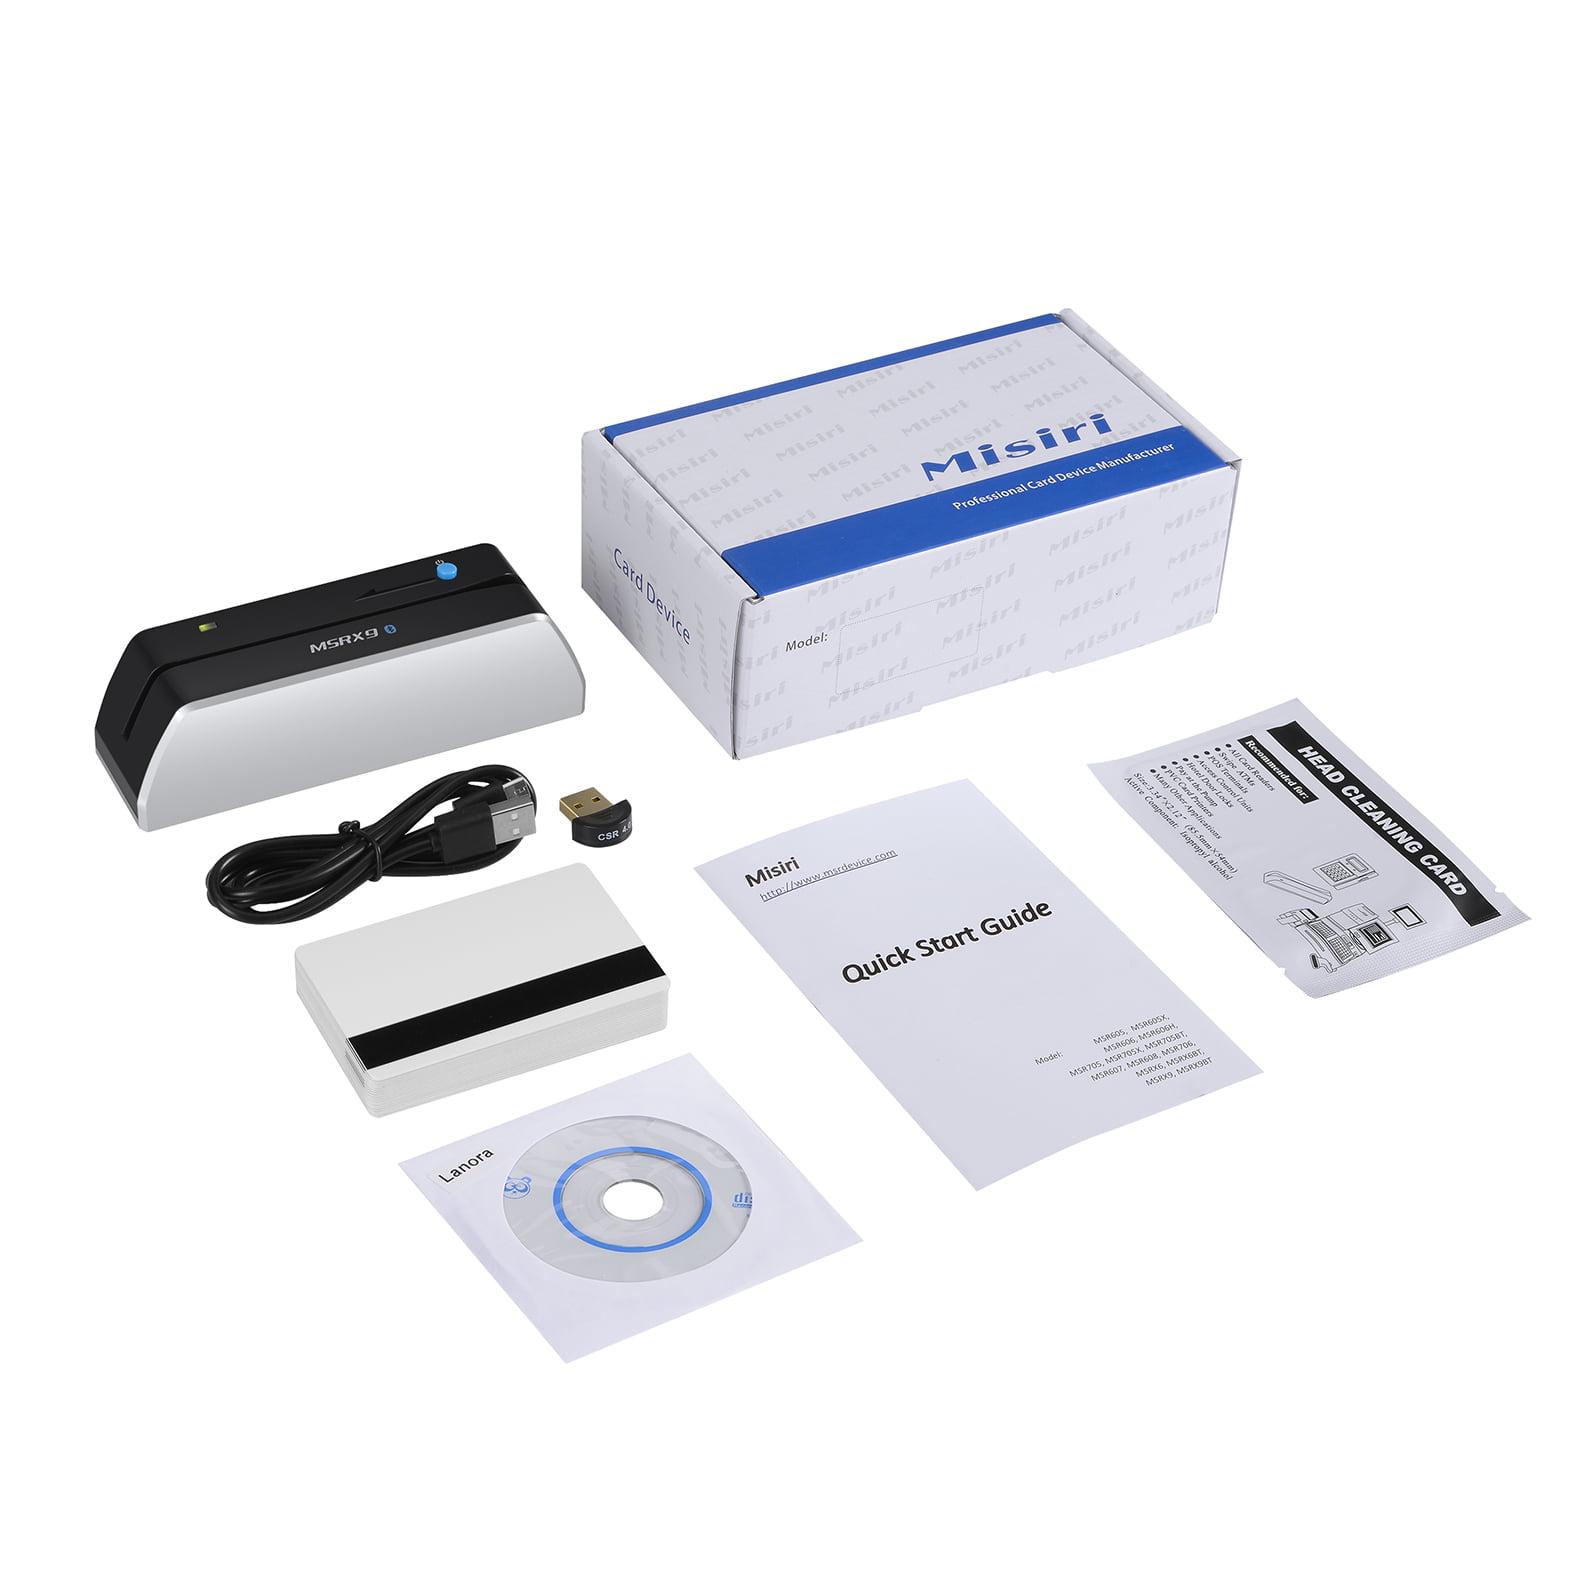 Misiri MSRX9BT Bluetooth HiCo Magstrip Smallest USB Magne...